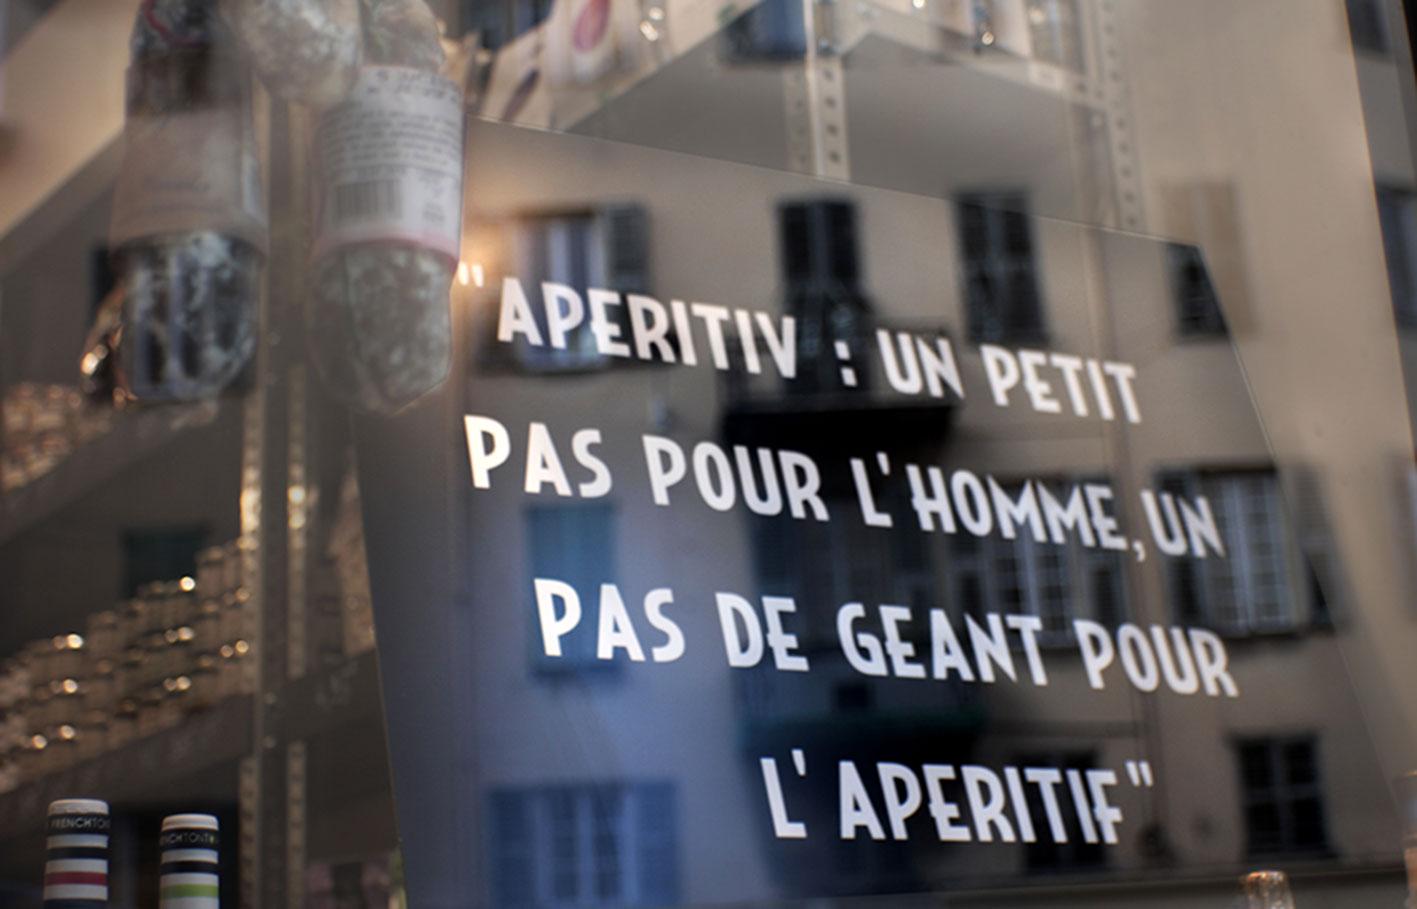 APERITIV NICE - Cécile Na